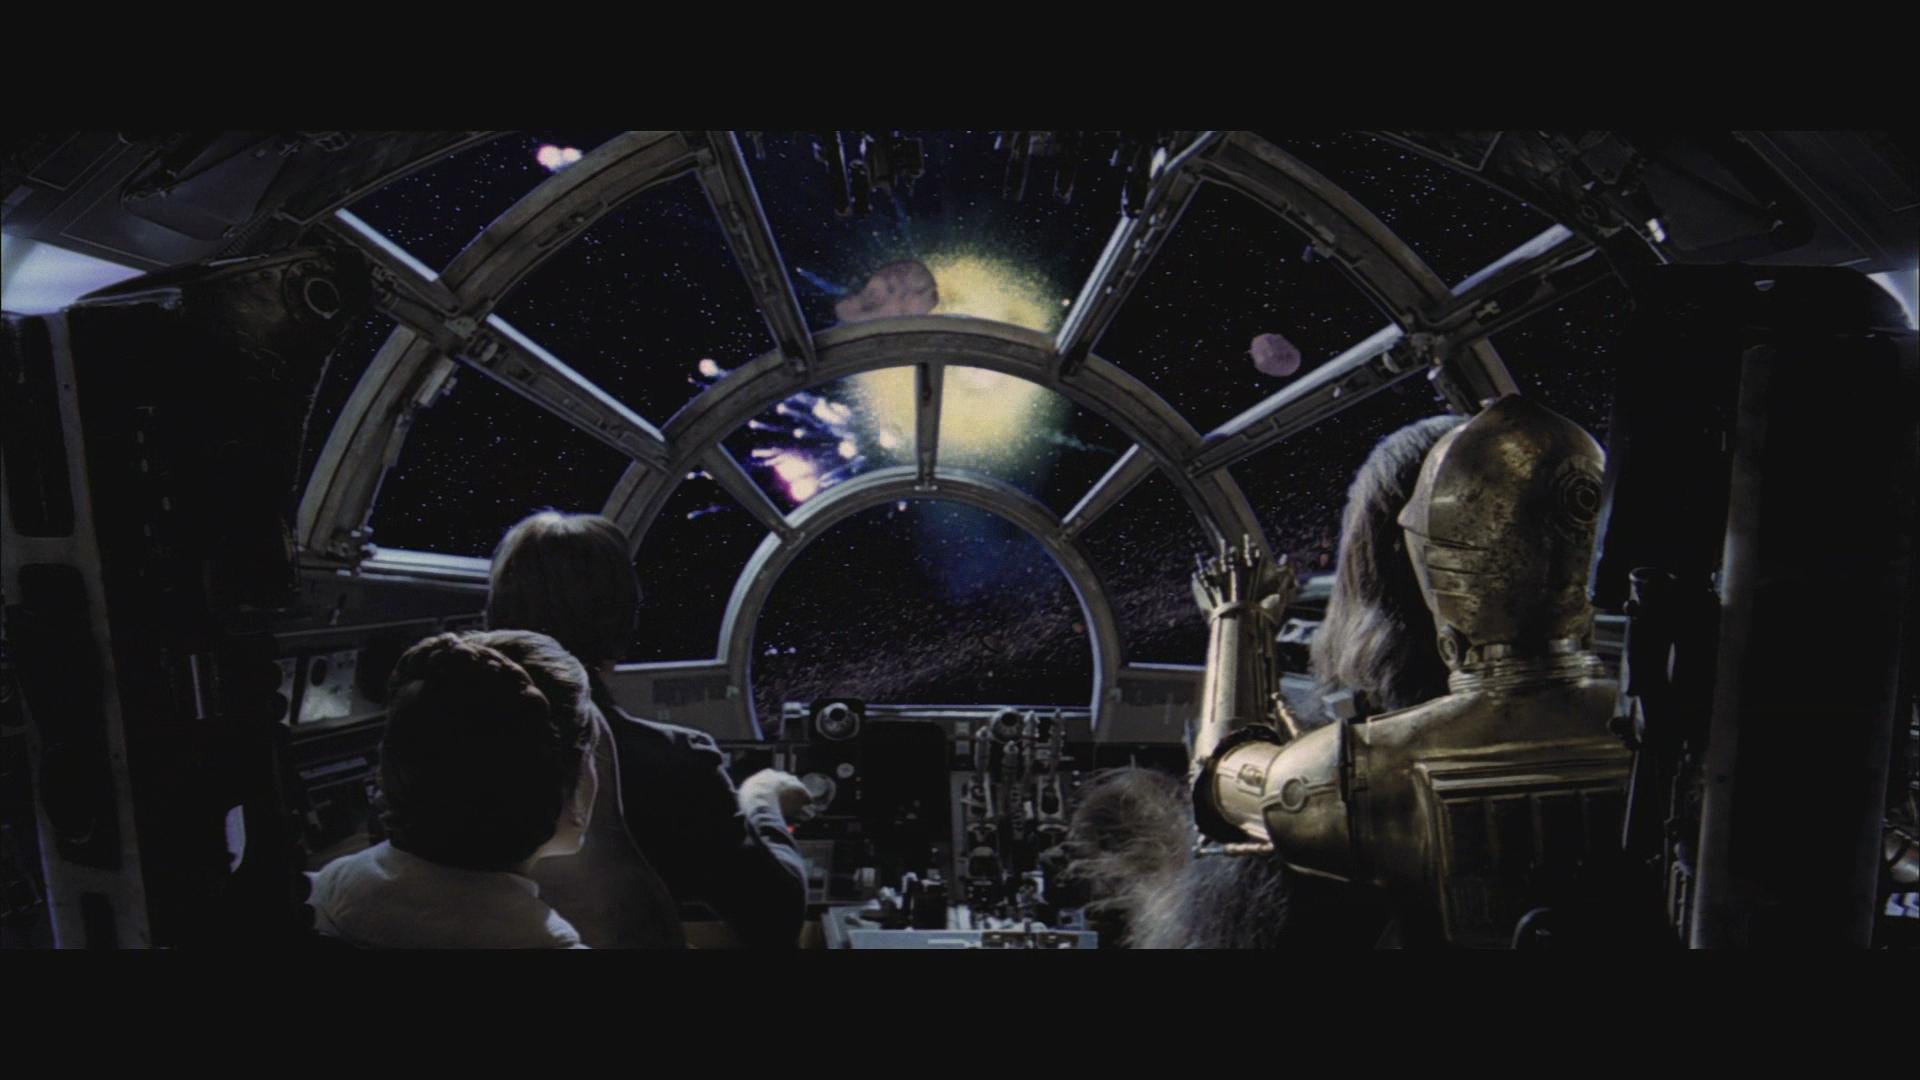 Star Wars Episode 5 Millennium Falcon Background Zoom 1920x1080 Download Hd Wallpaper Wallpapertip